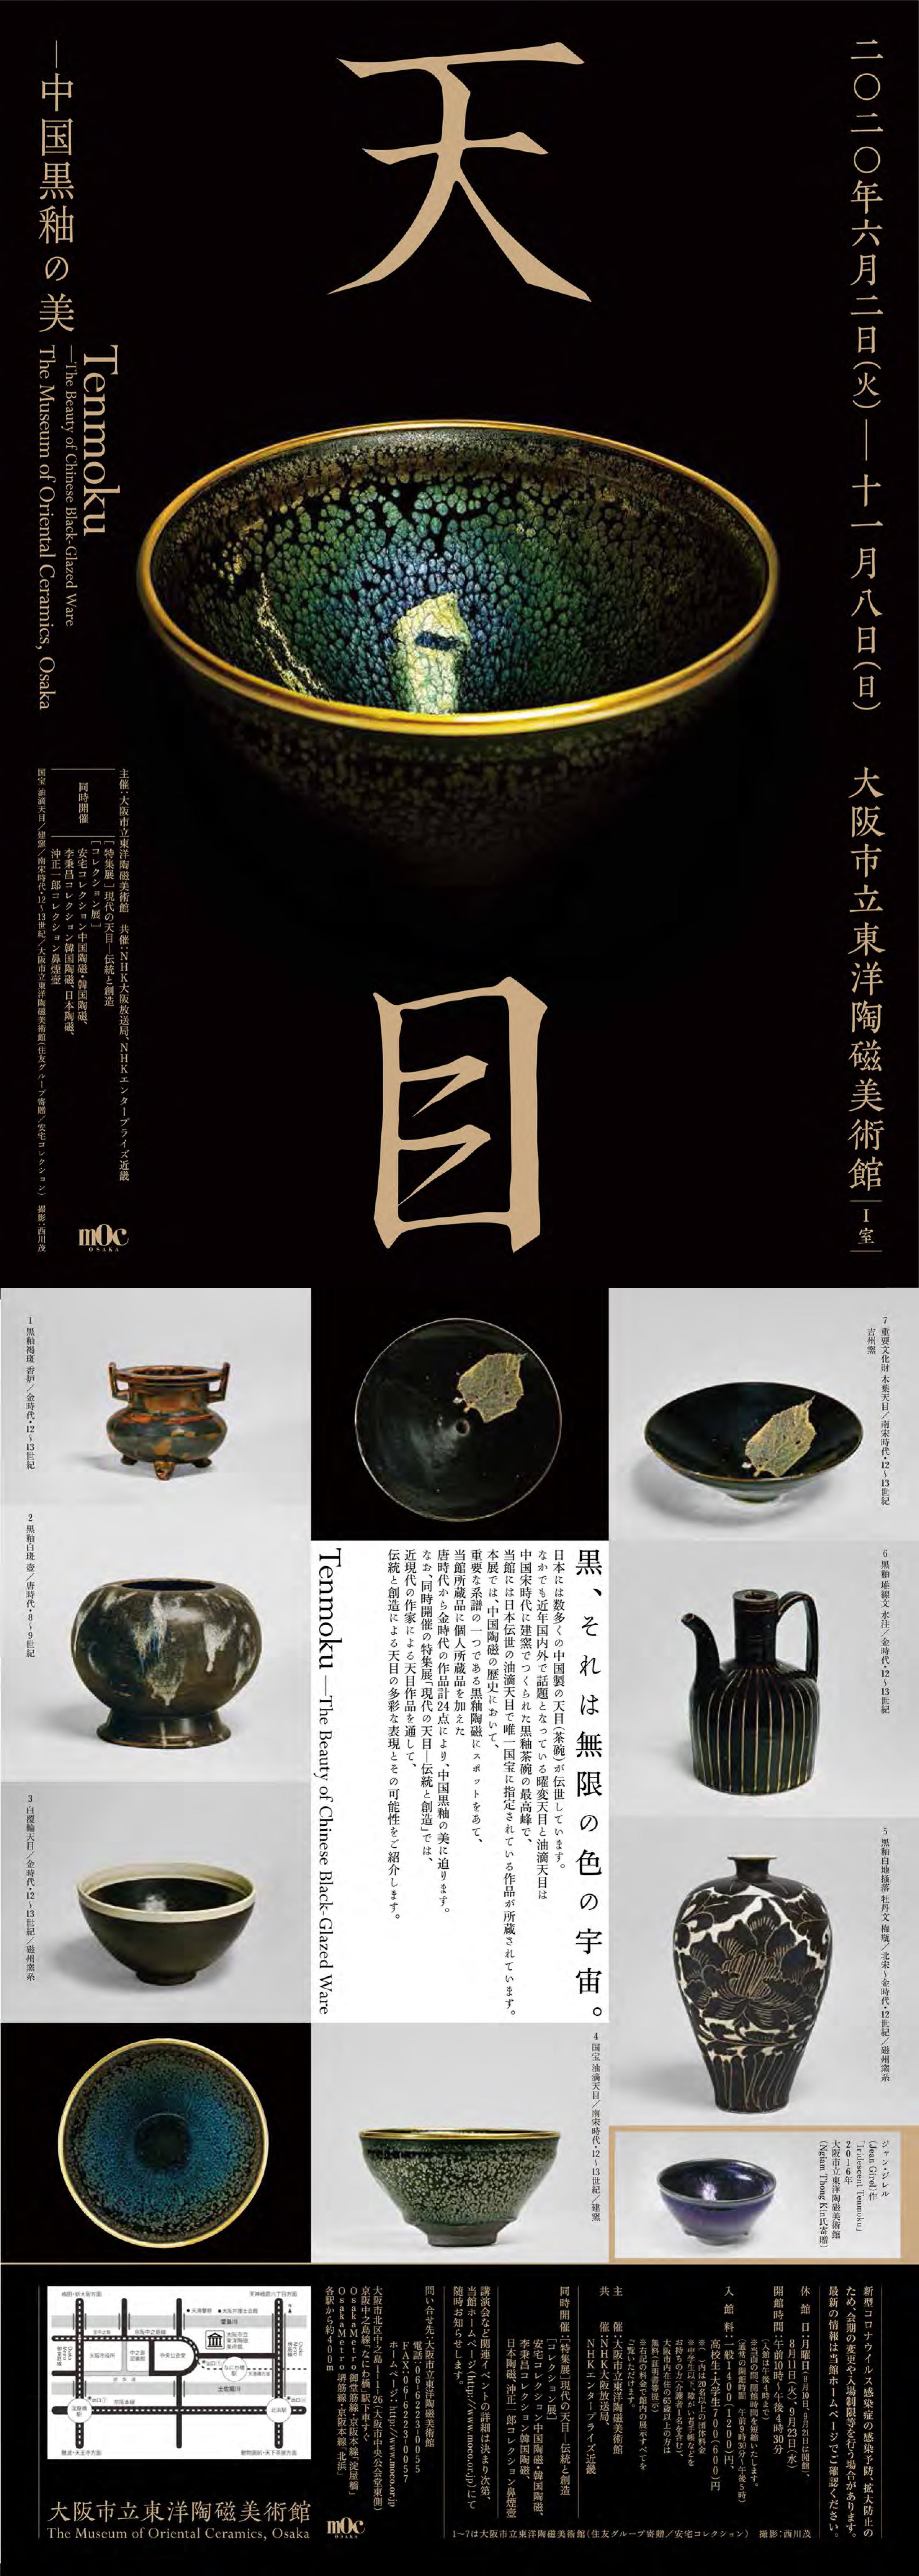 特別展「天目―中国黒釉の美」